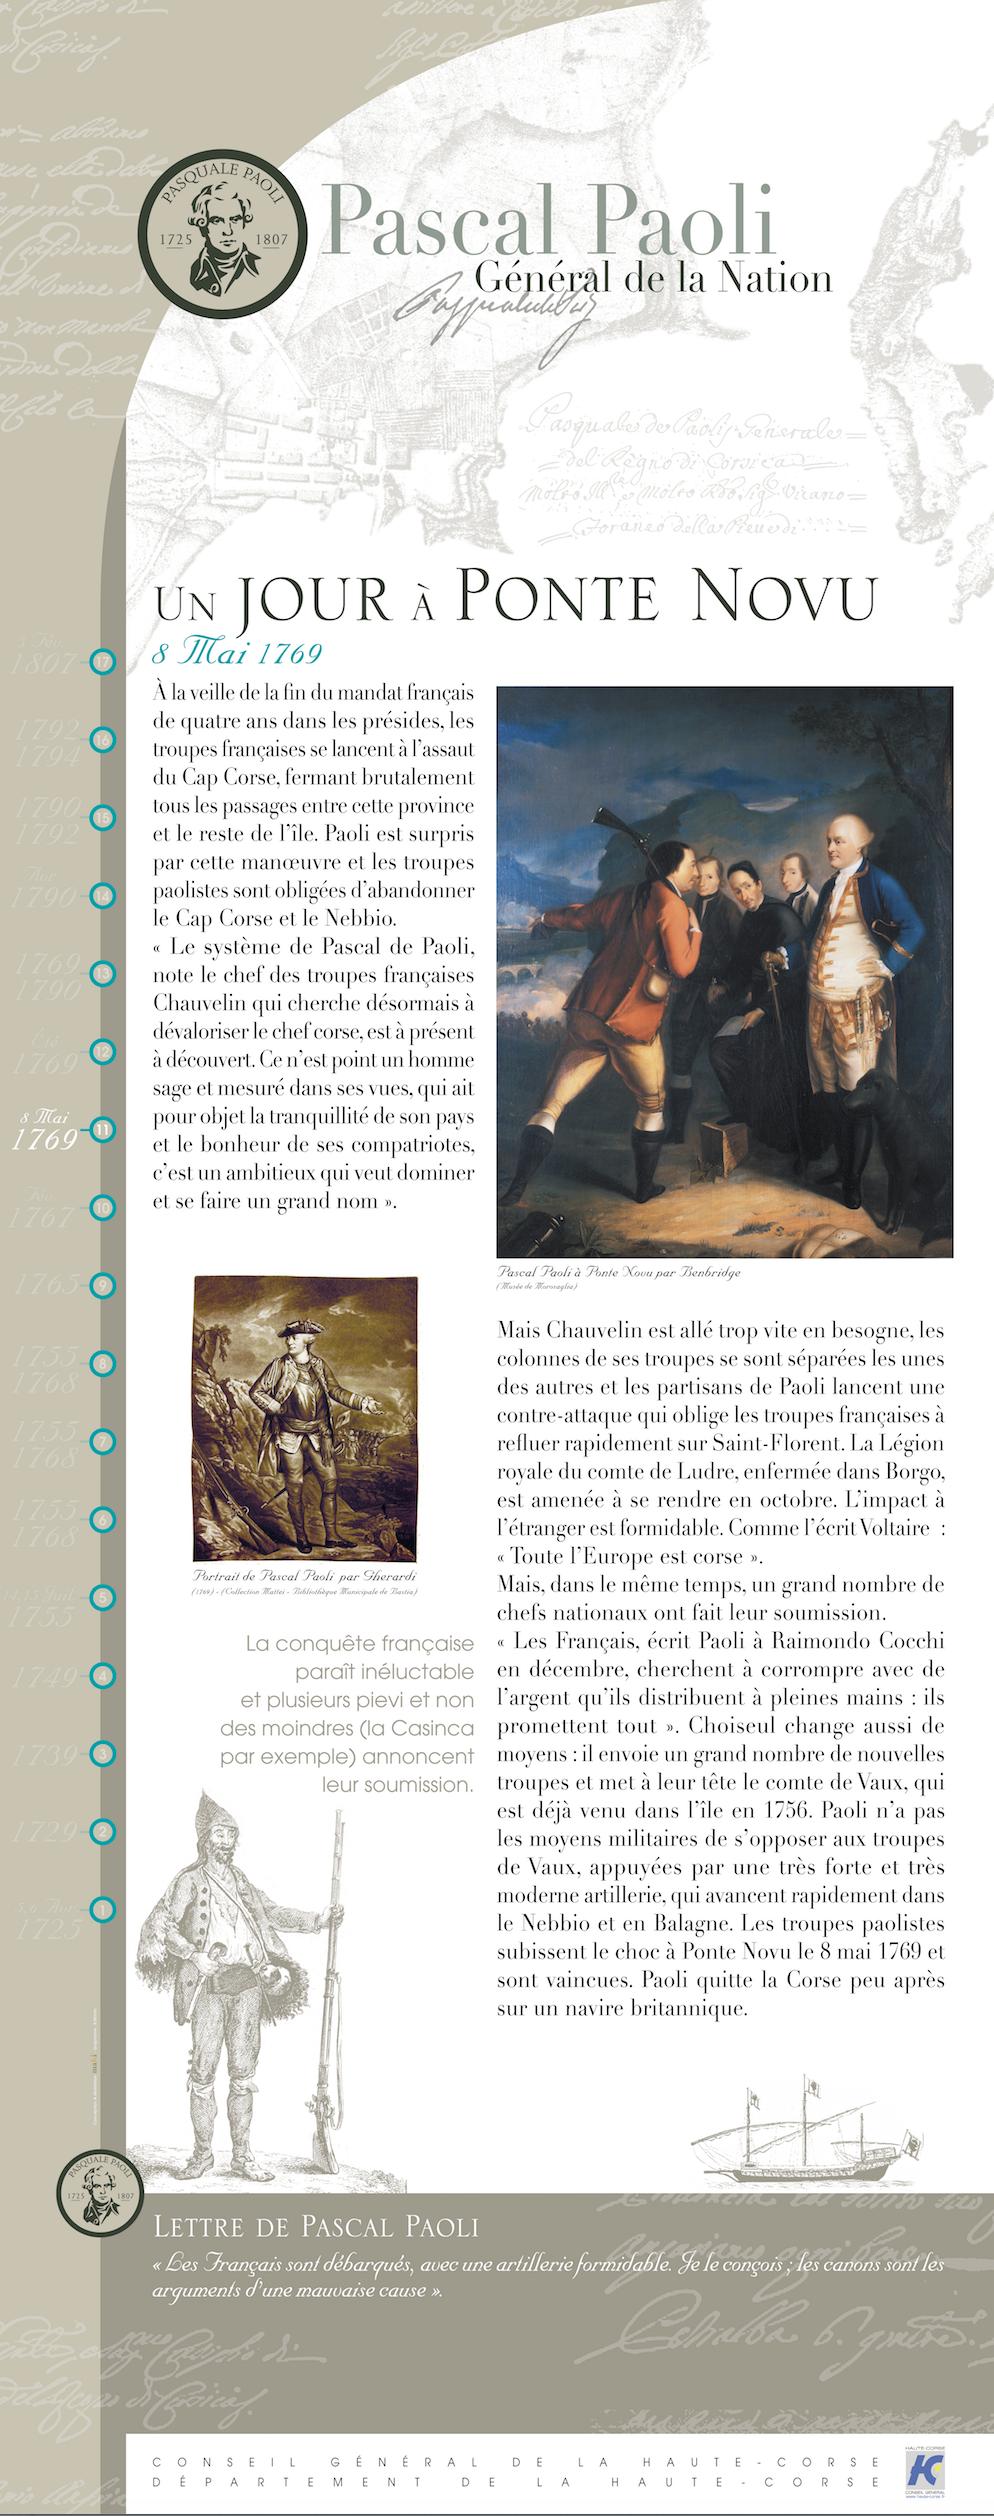 La bataille de Ponte-Novu - A battaglia di u Ponte Novu